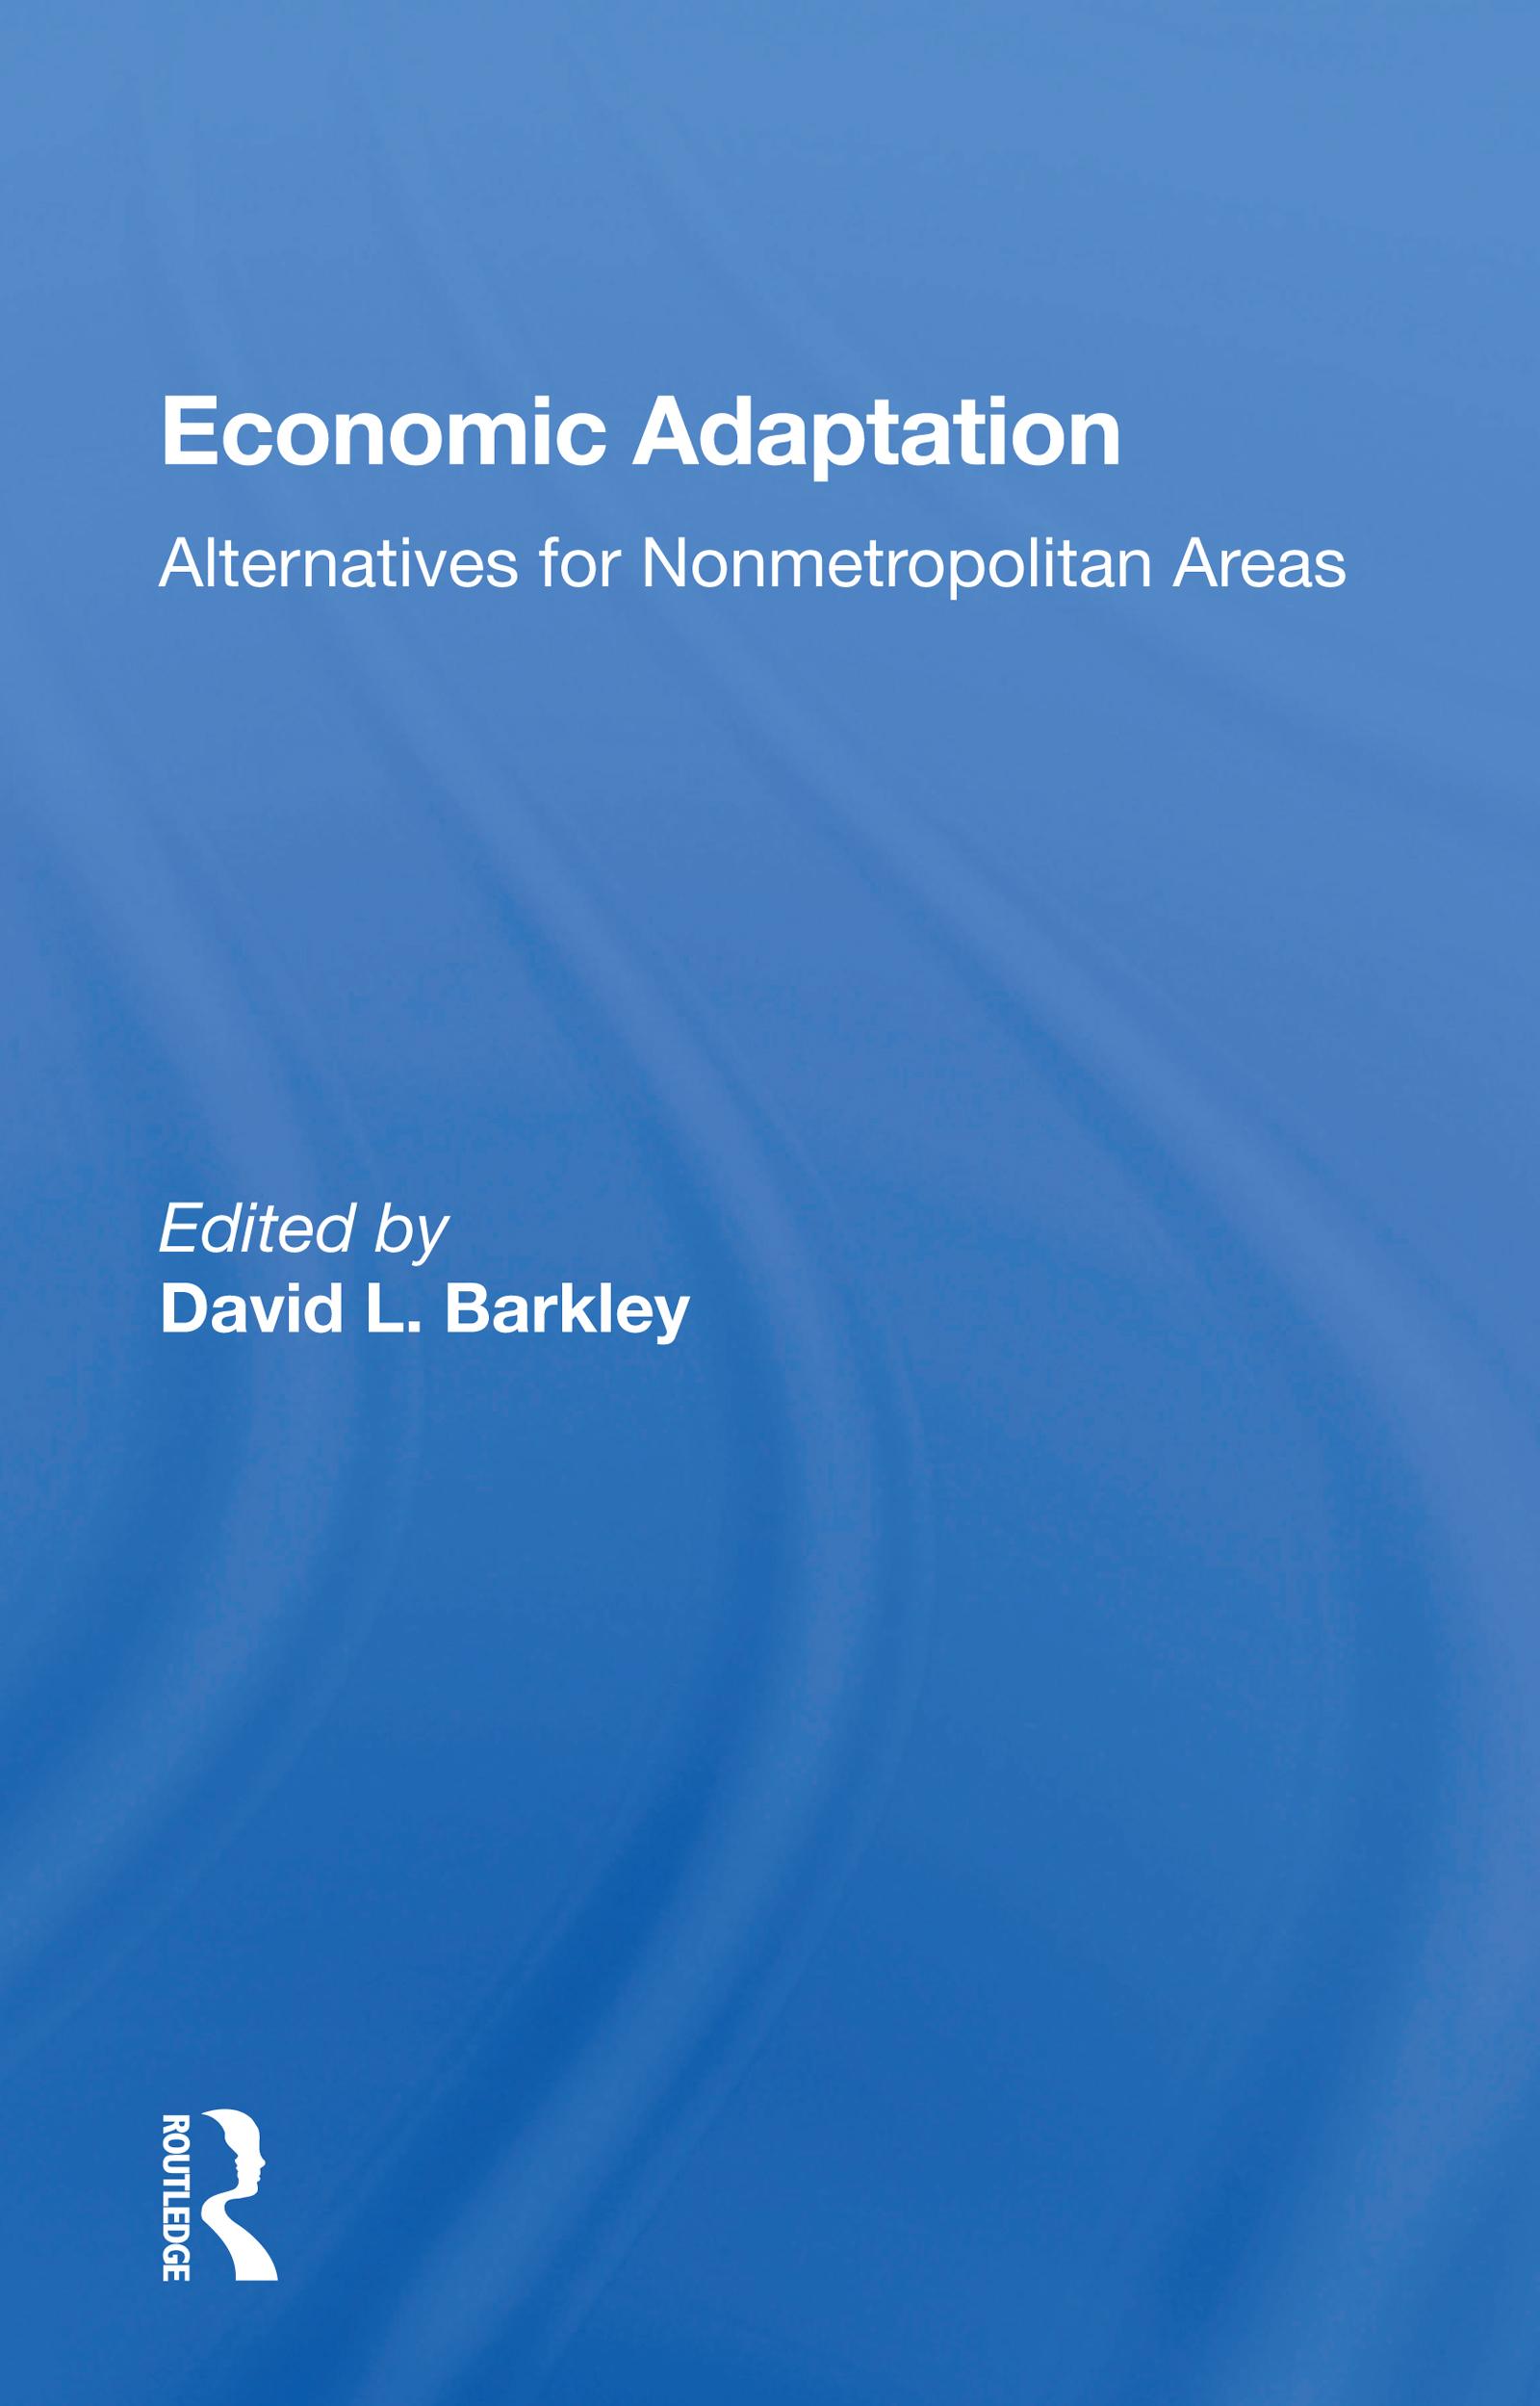 Economic Adaptation